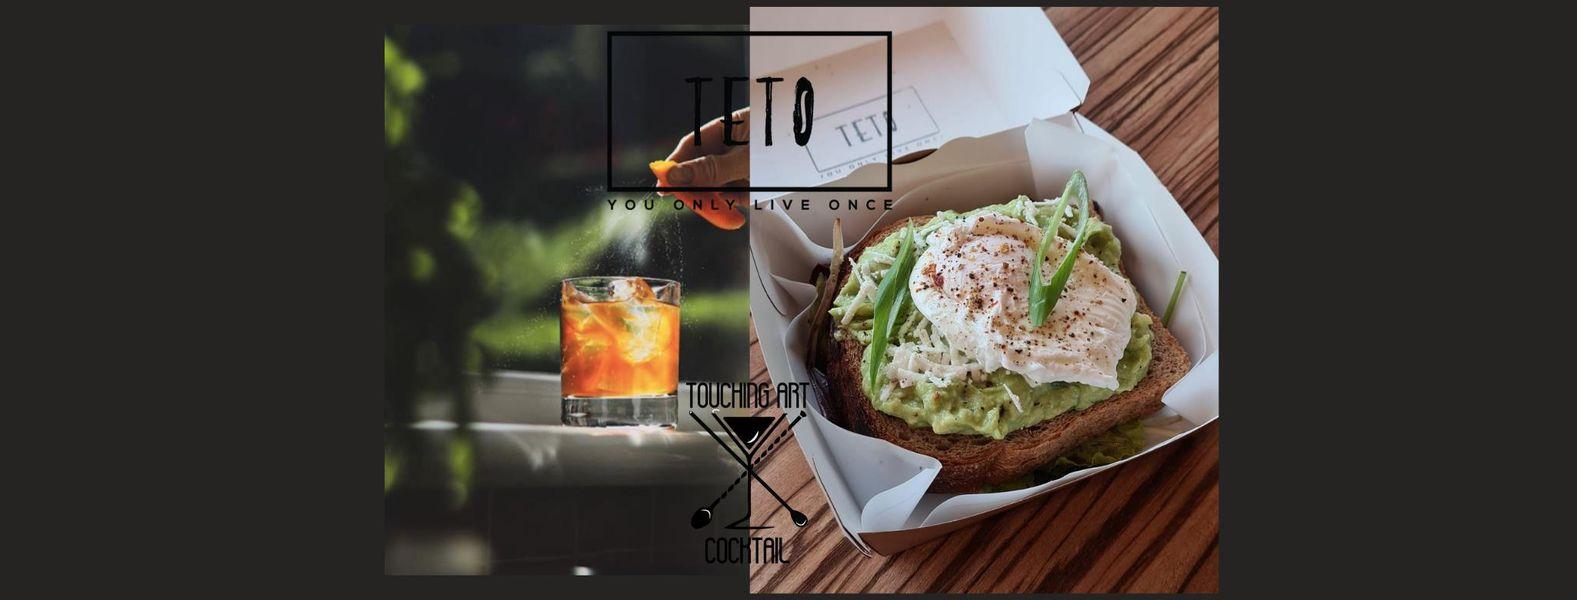 evenimente weekend 30 oct- 1 nov Avo toast & cocktails la Teto